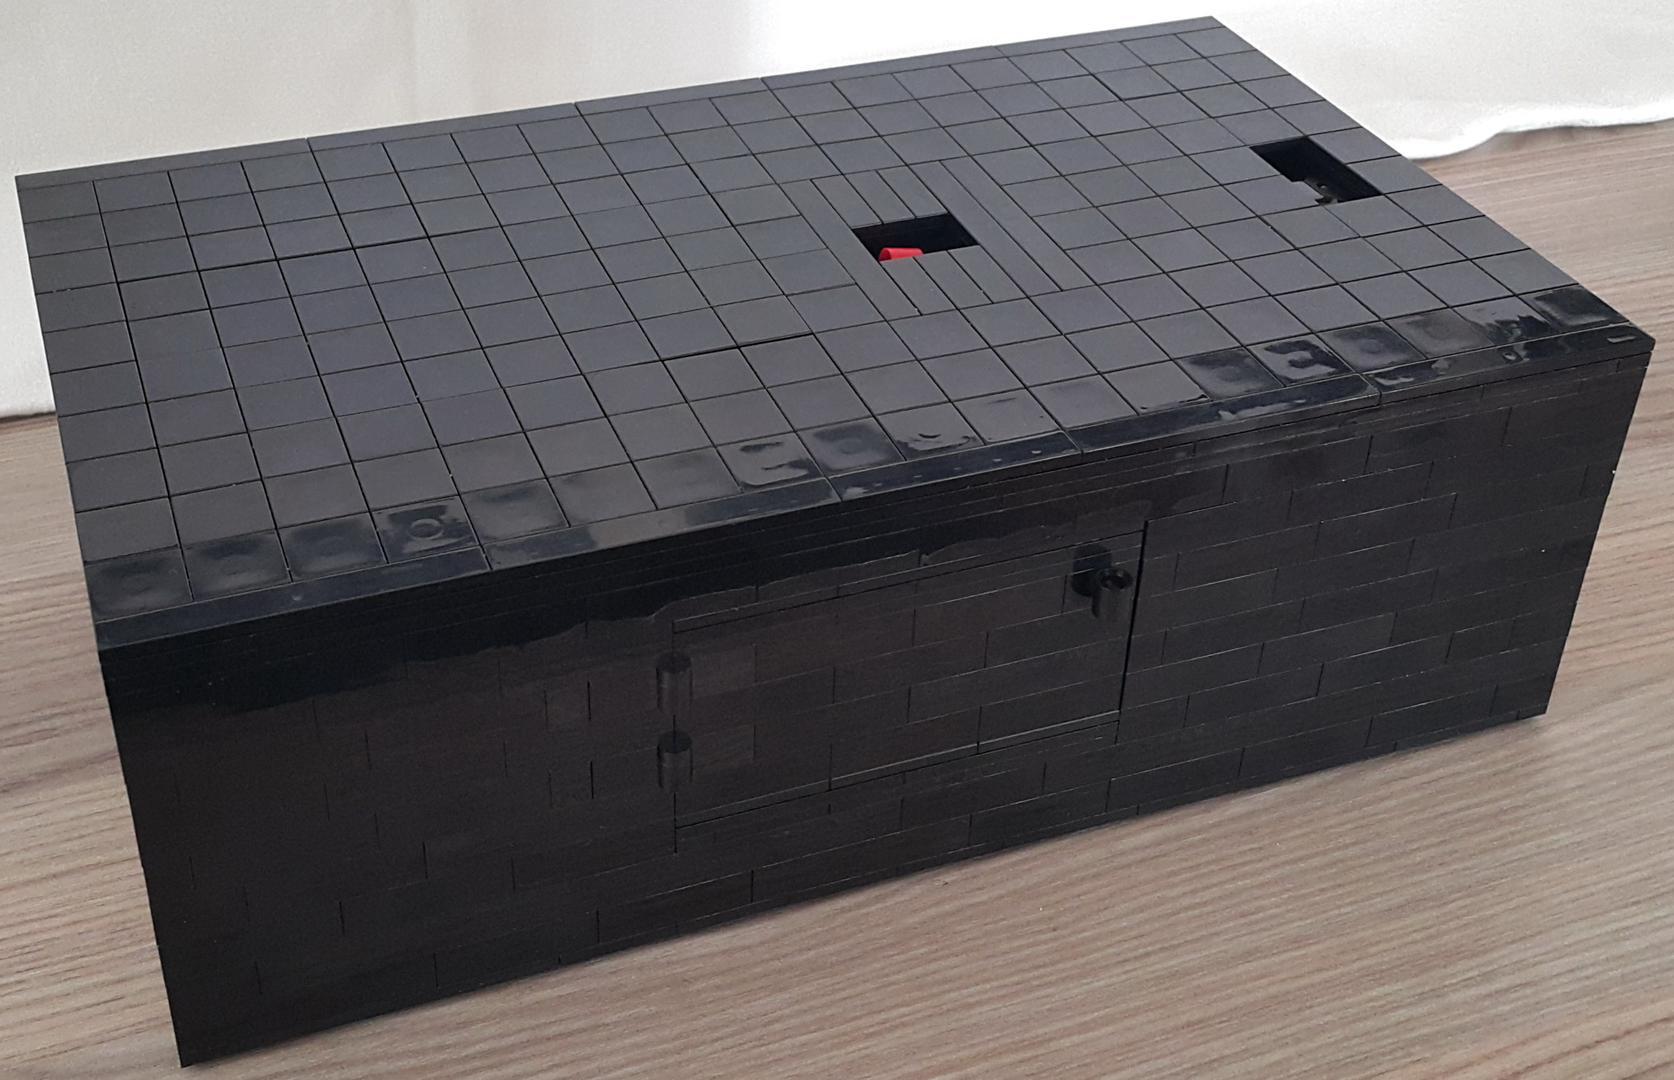 Lego Moc 0899 Luuma Ev3 Core Lego Ultimate Machine Mindstorms